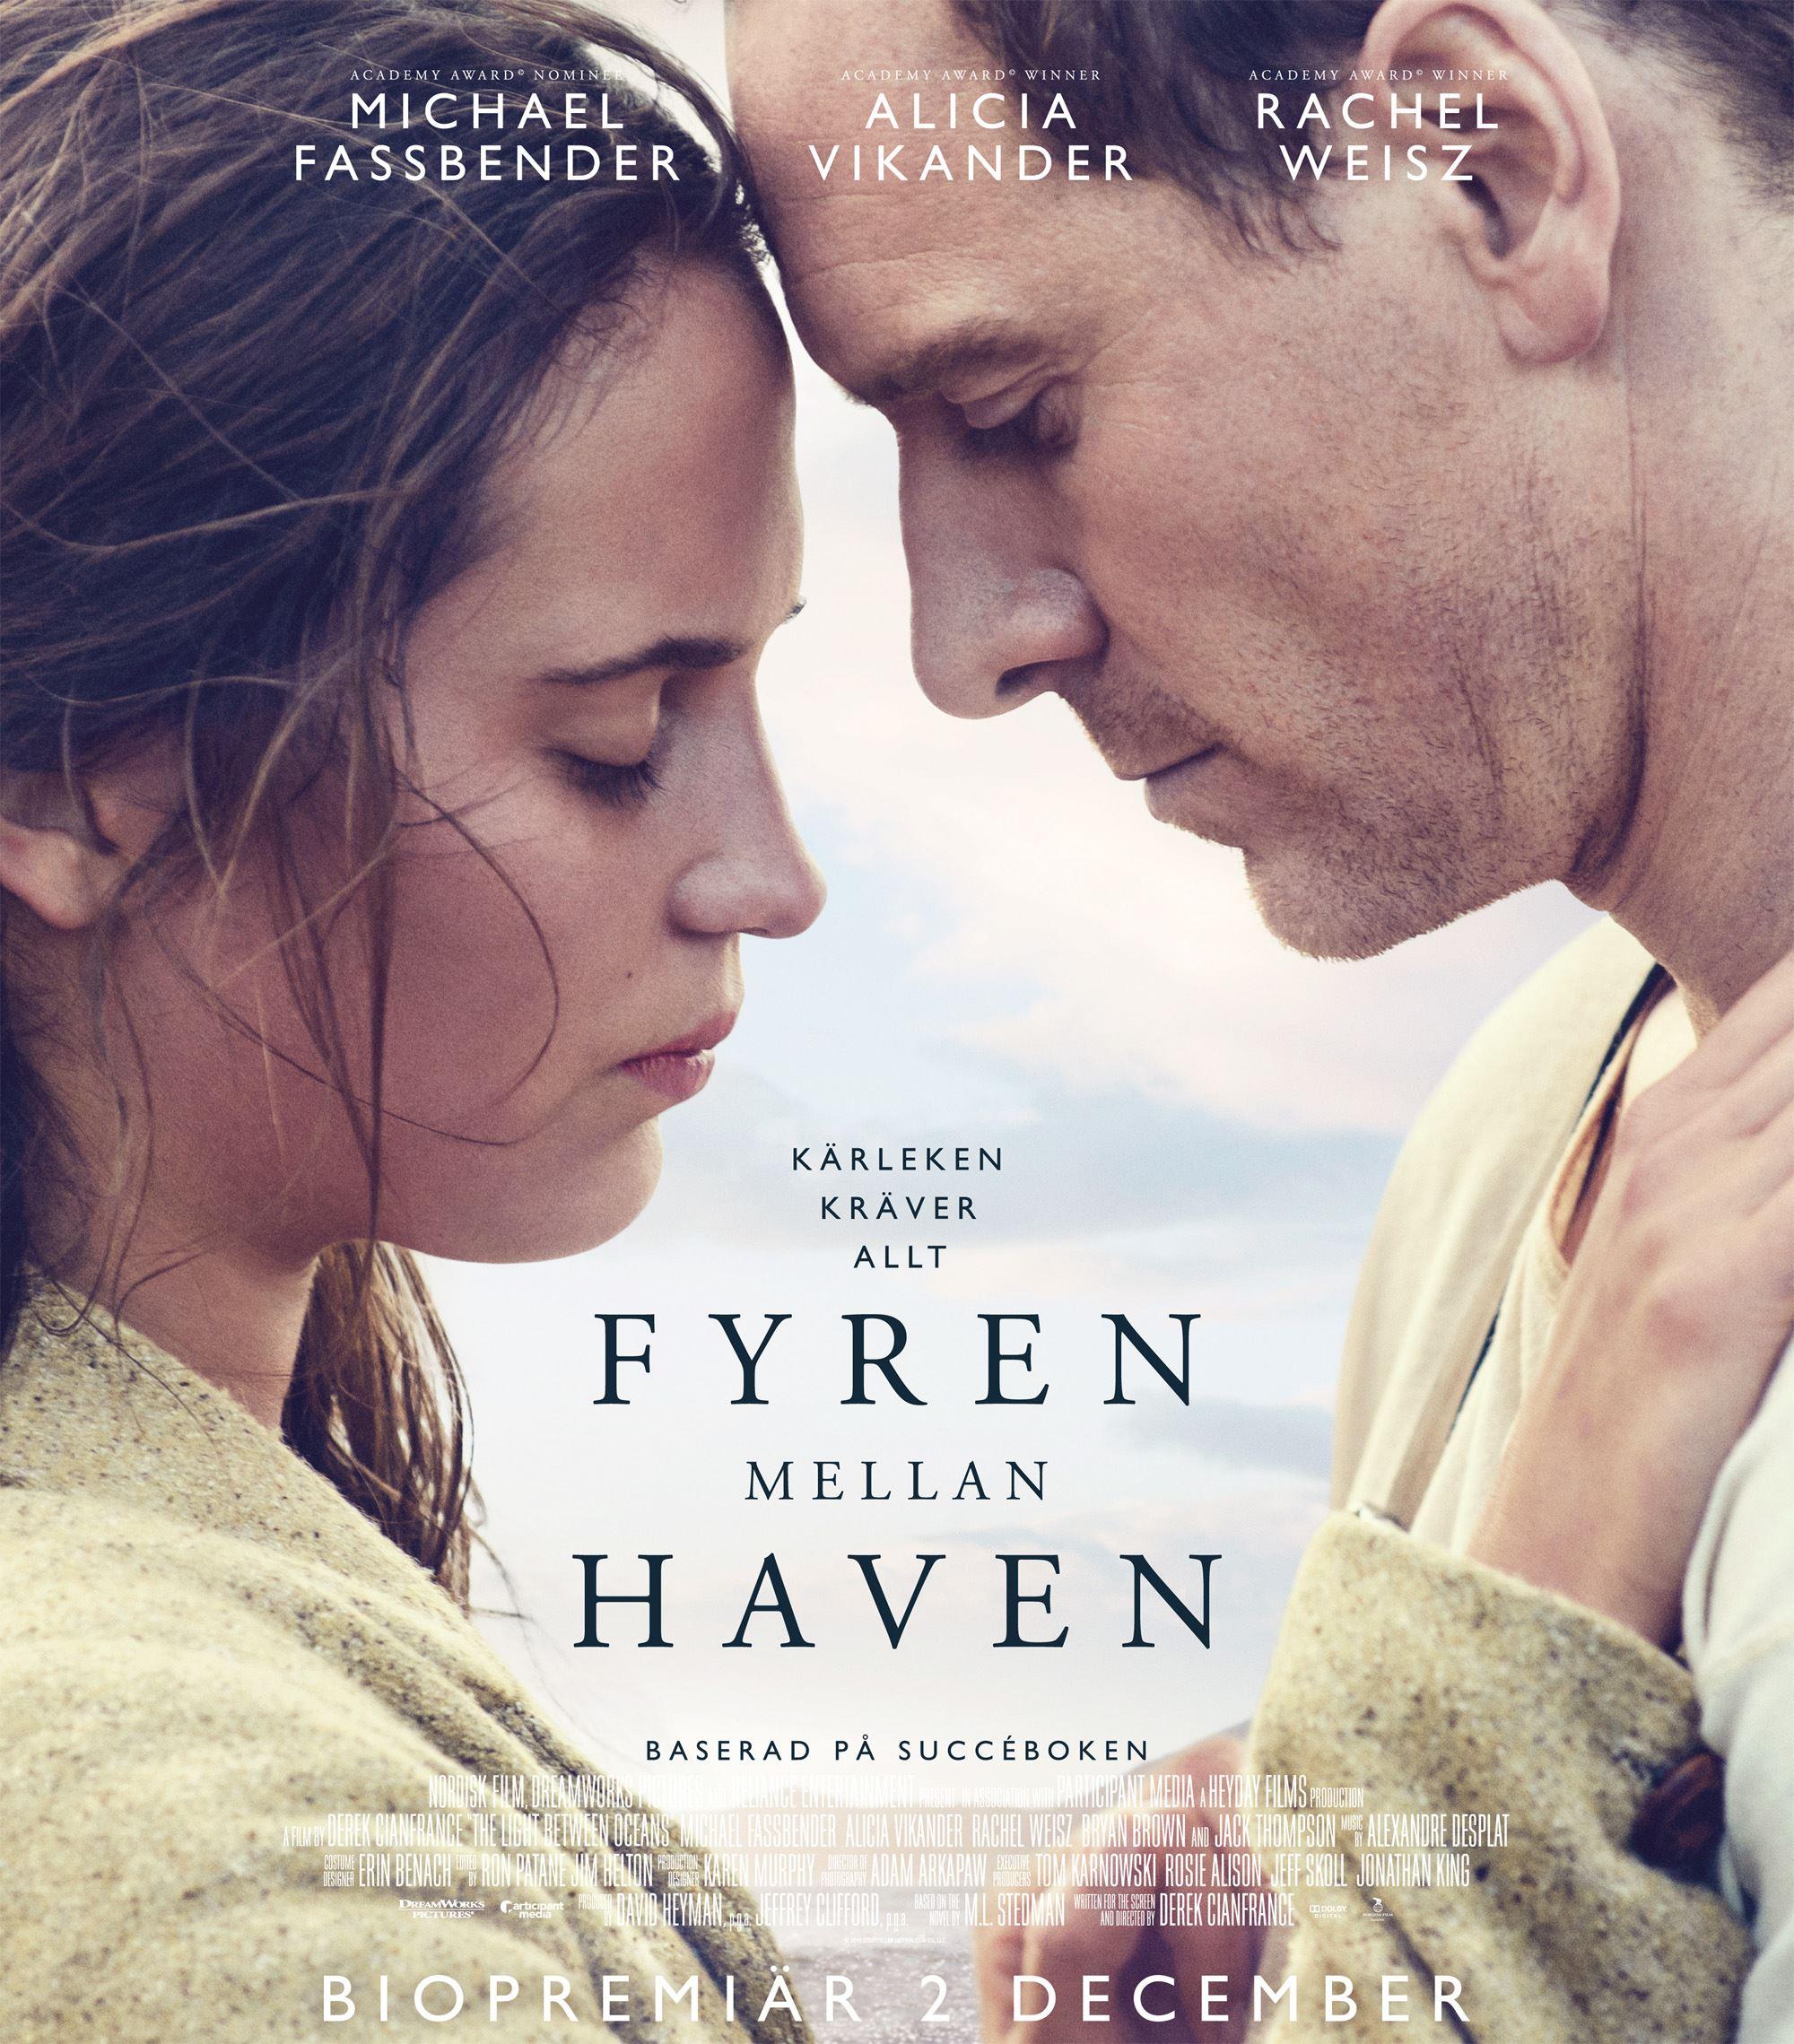 Eftermiddagsbio - FYREN MELLAN HAVEN